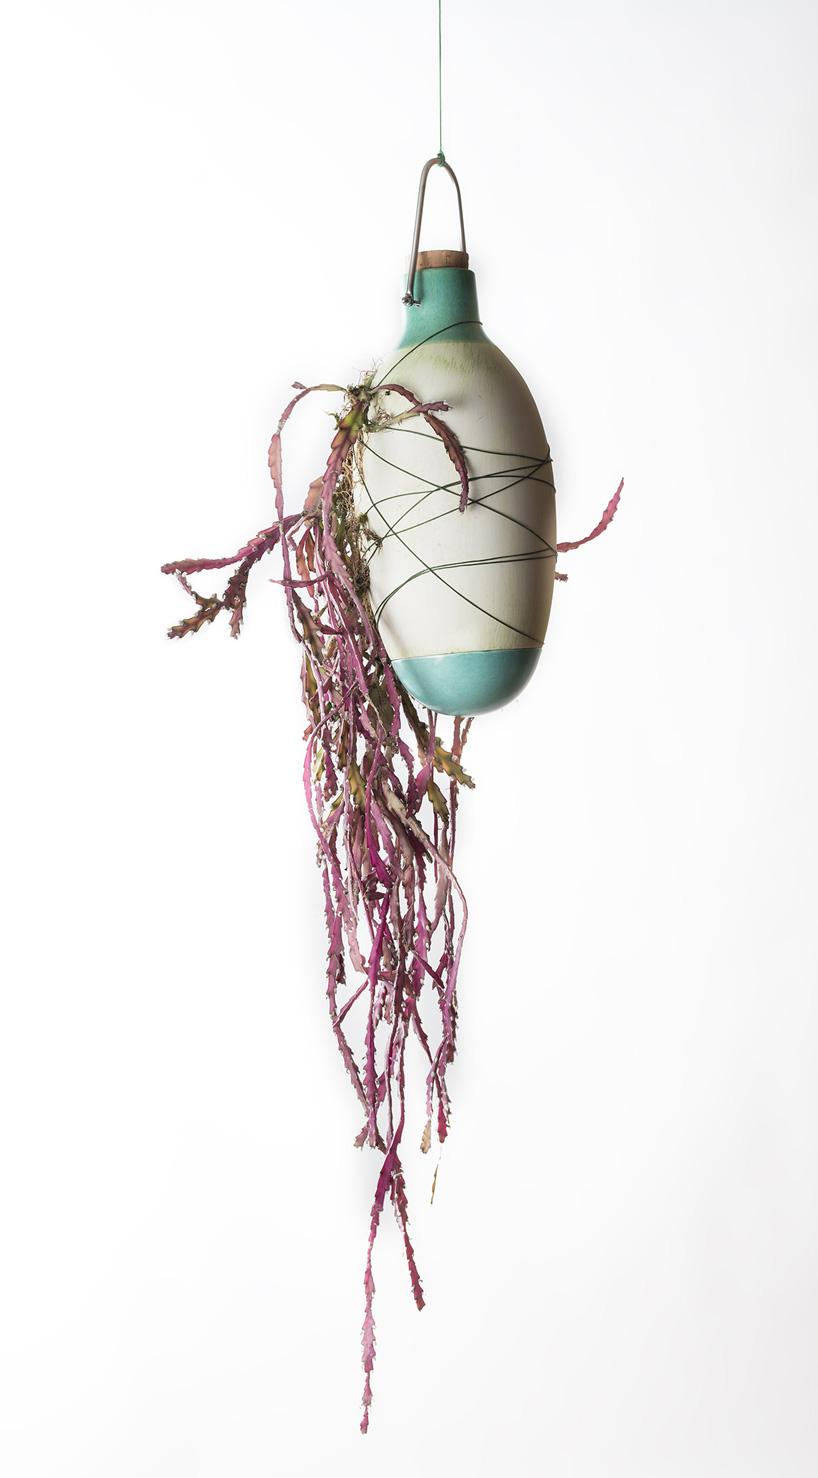 dossofiorito-epiphytes-milan-design-week-designboom-07